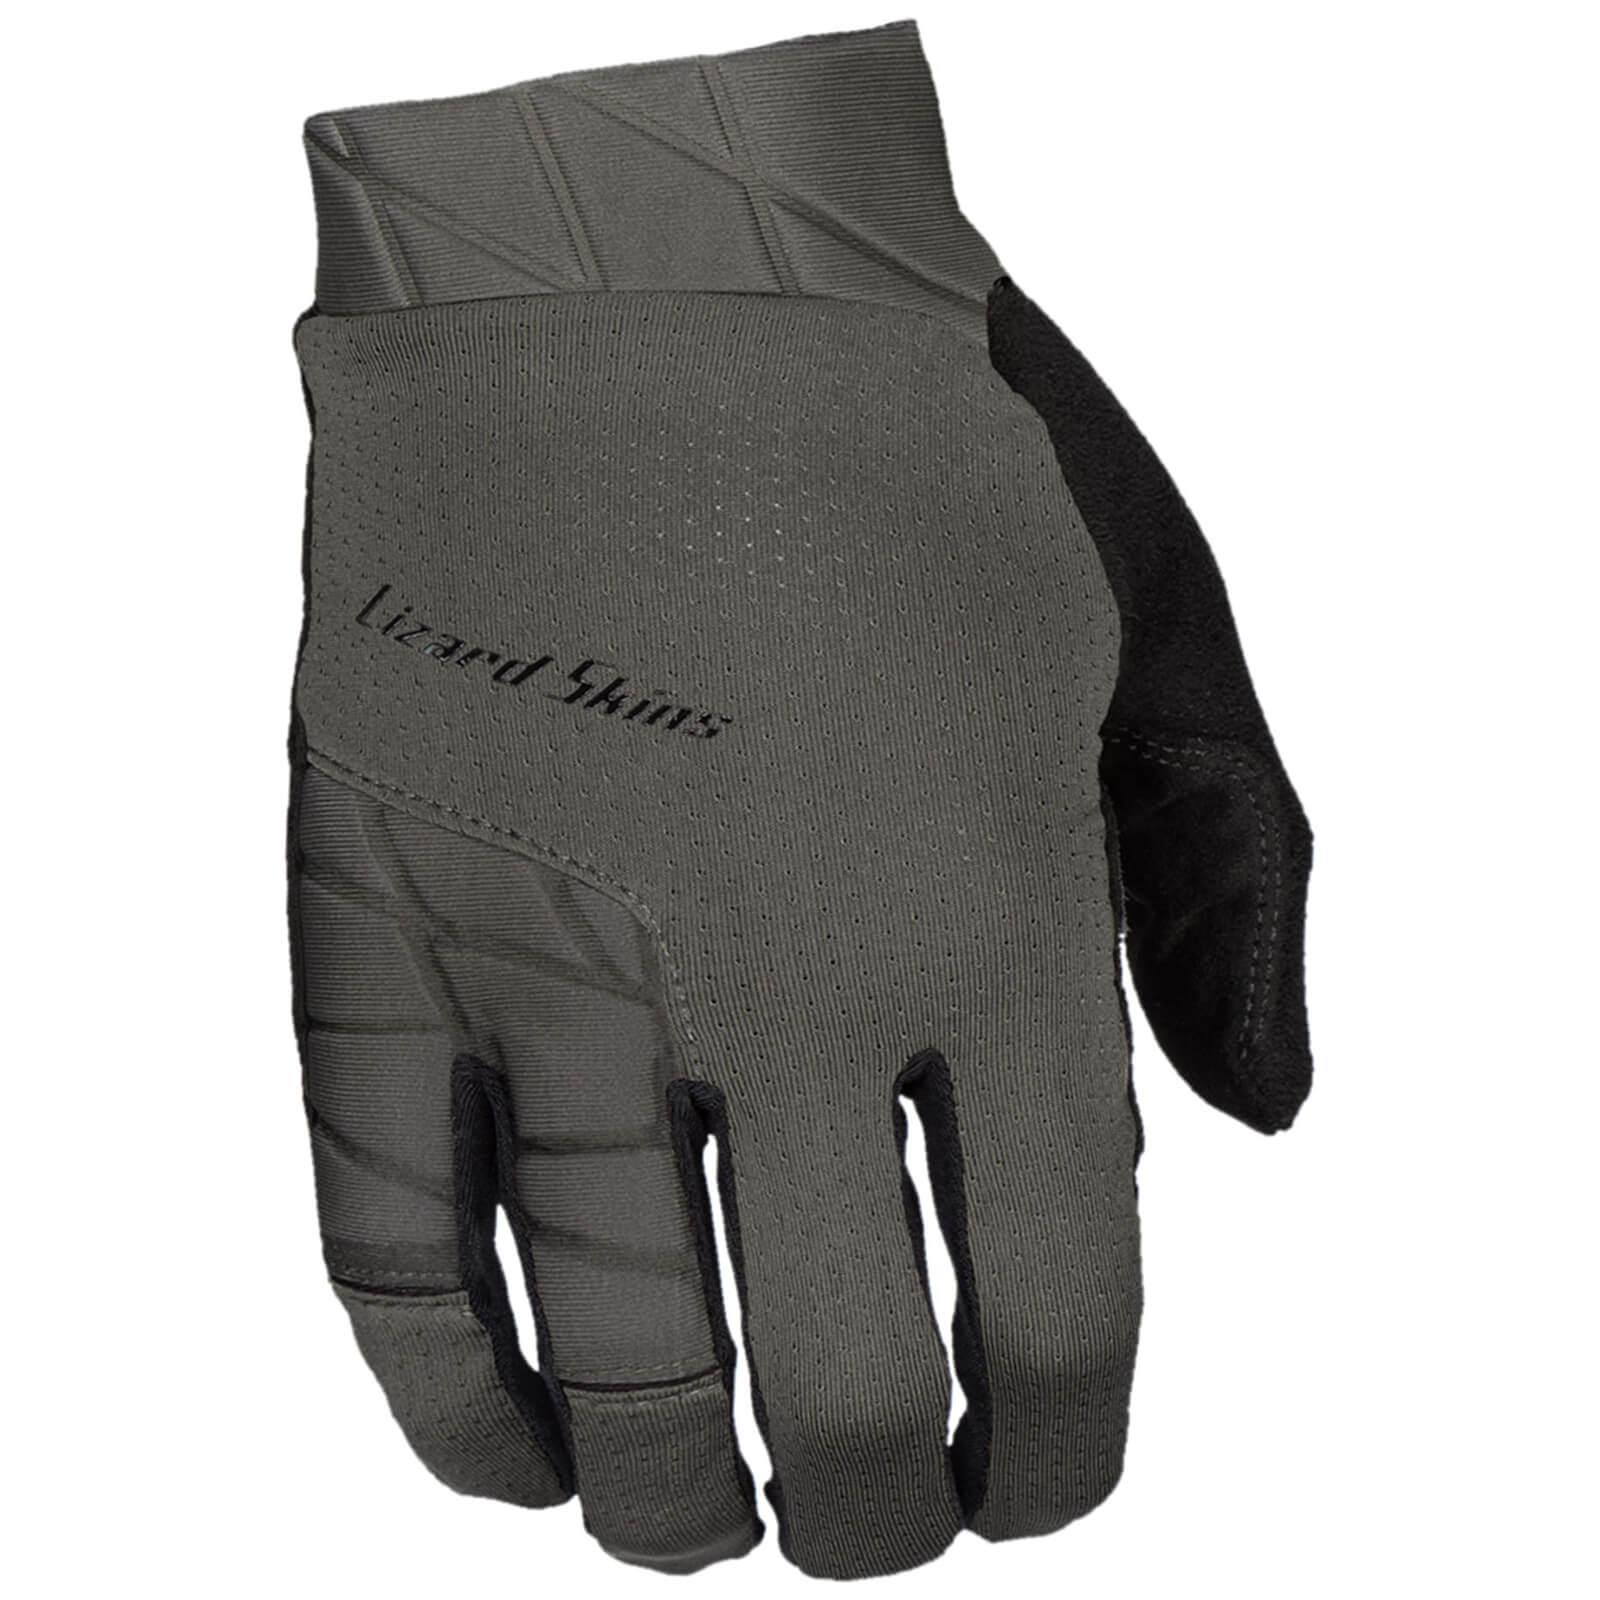 Lizard Skins Monitor Ops Gloves - L - Graphite Grey